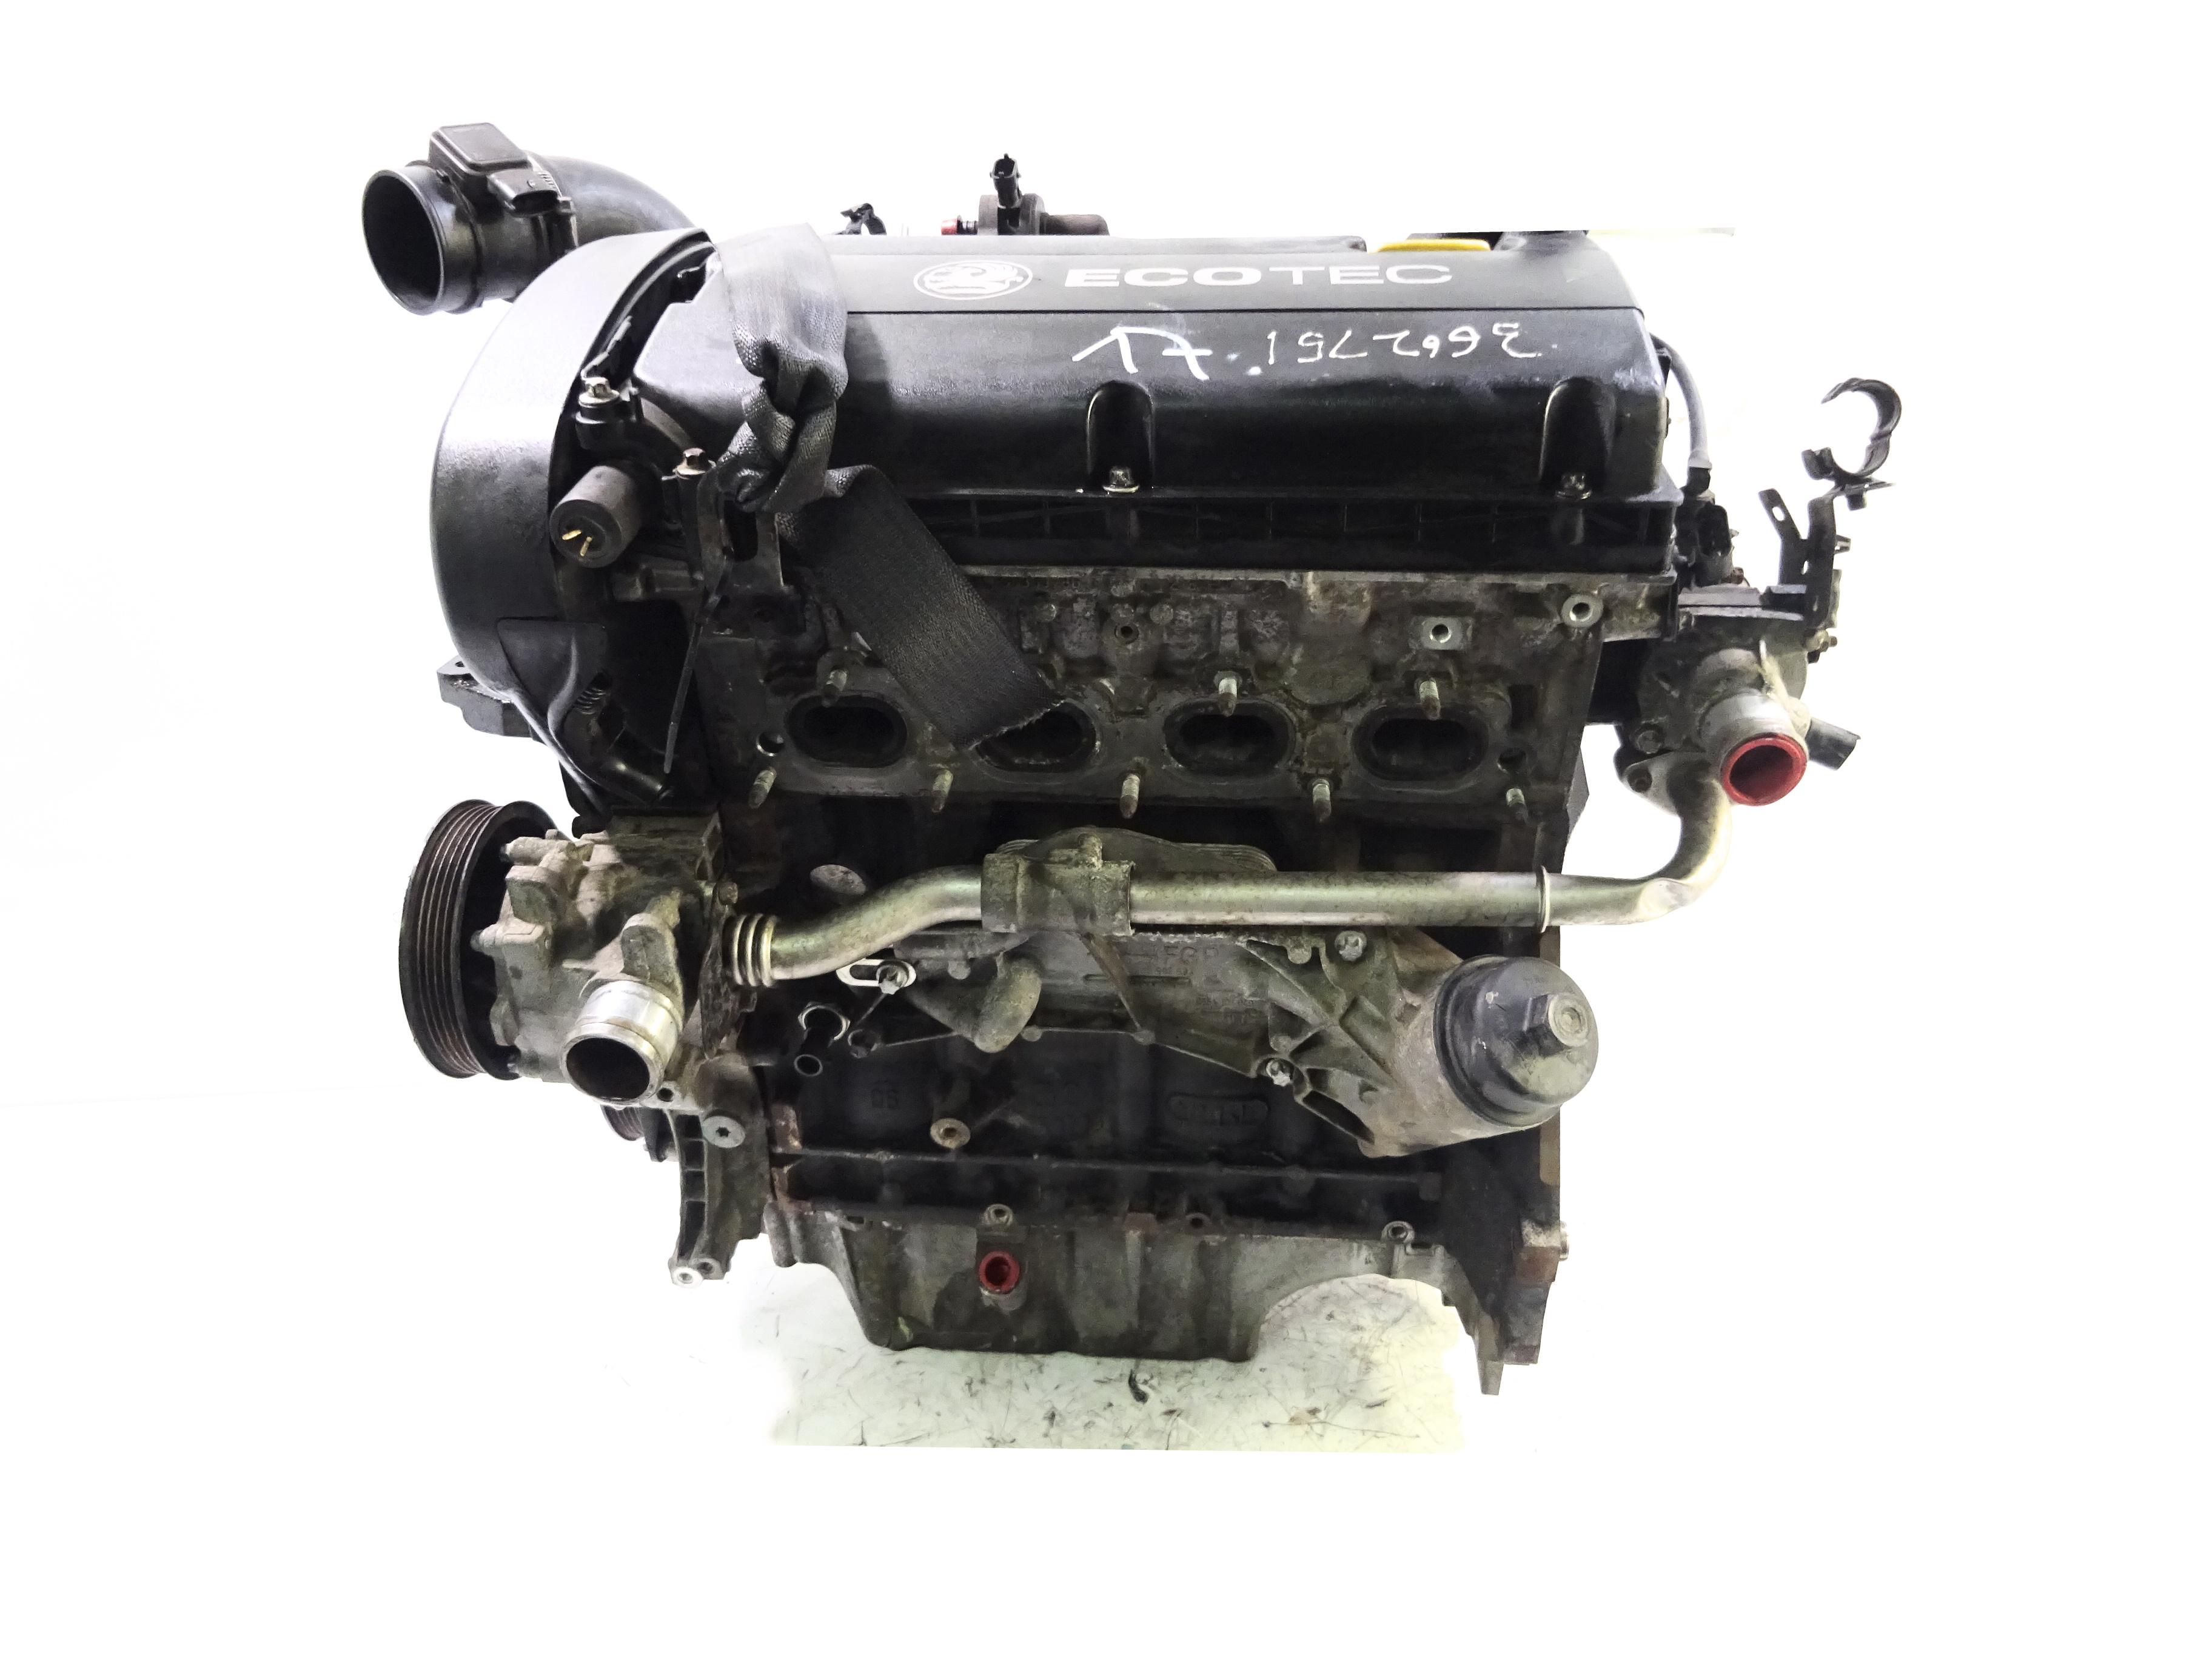 Motor 2007 für Opel Astra H 1,8 Benzin Z18XER Z18 118.000 KM